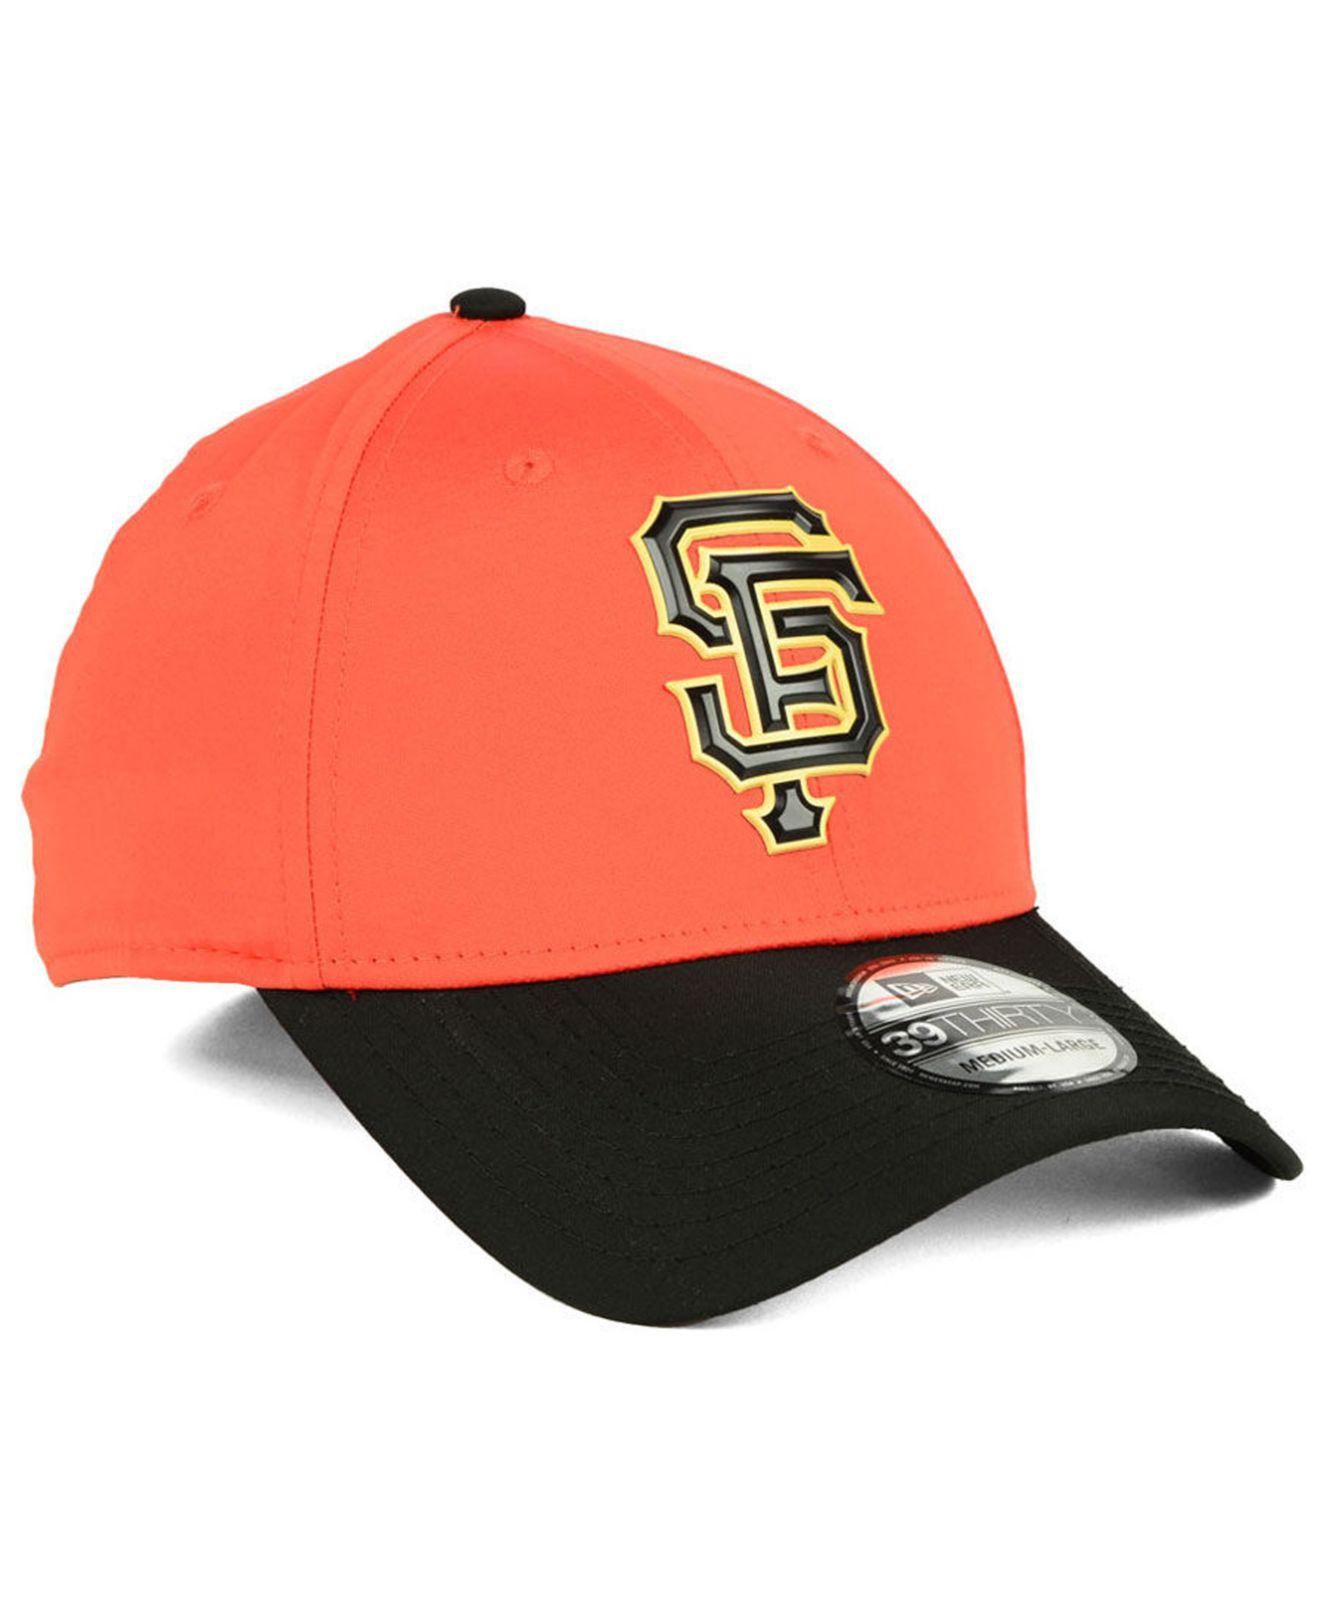 release date 32732 2149f ... get san francisco giants batting practice 39thirty cap for men lyst.  view fullscreen 2c0b5 afdcf